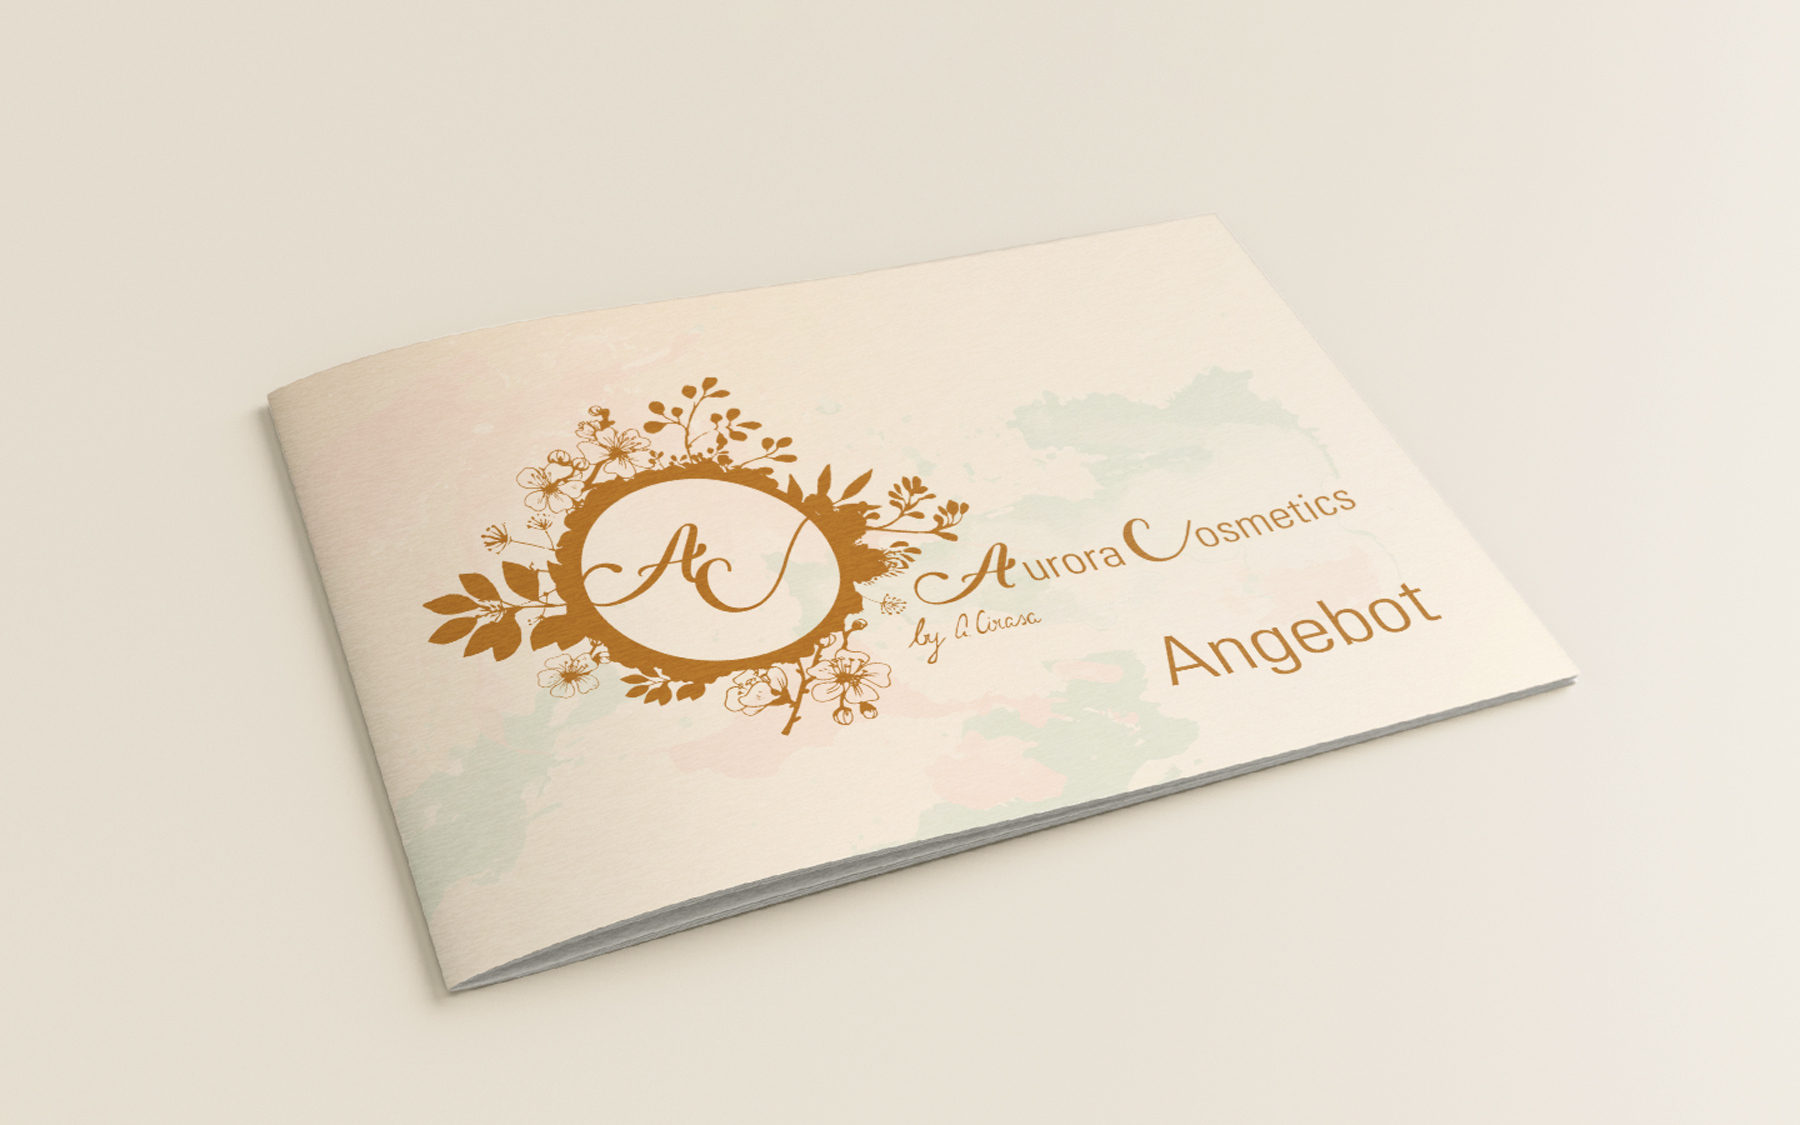 Angebotsbroschüre Aurora Cosmetic